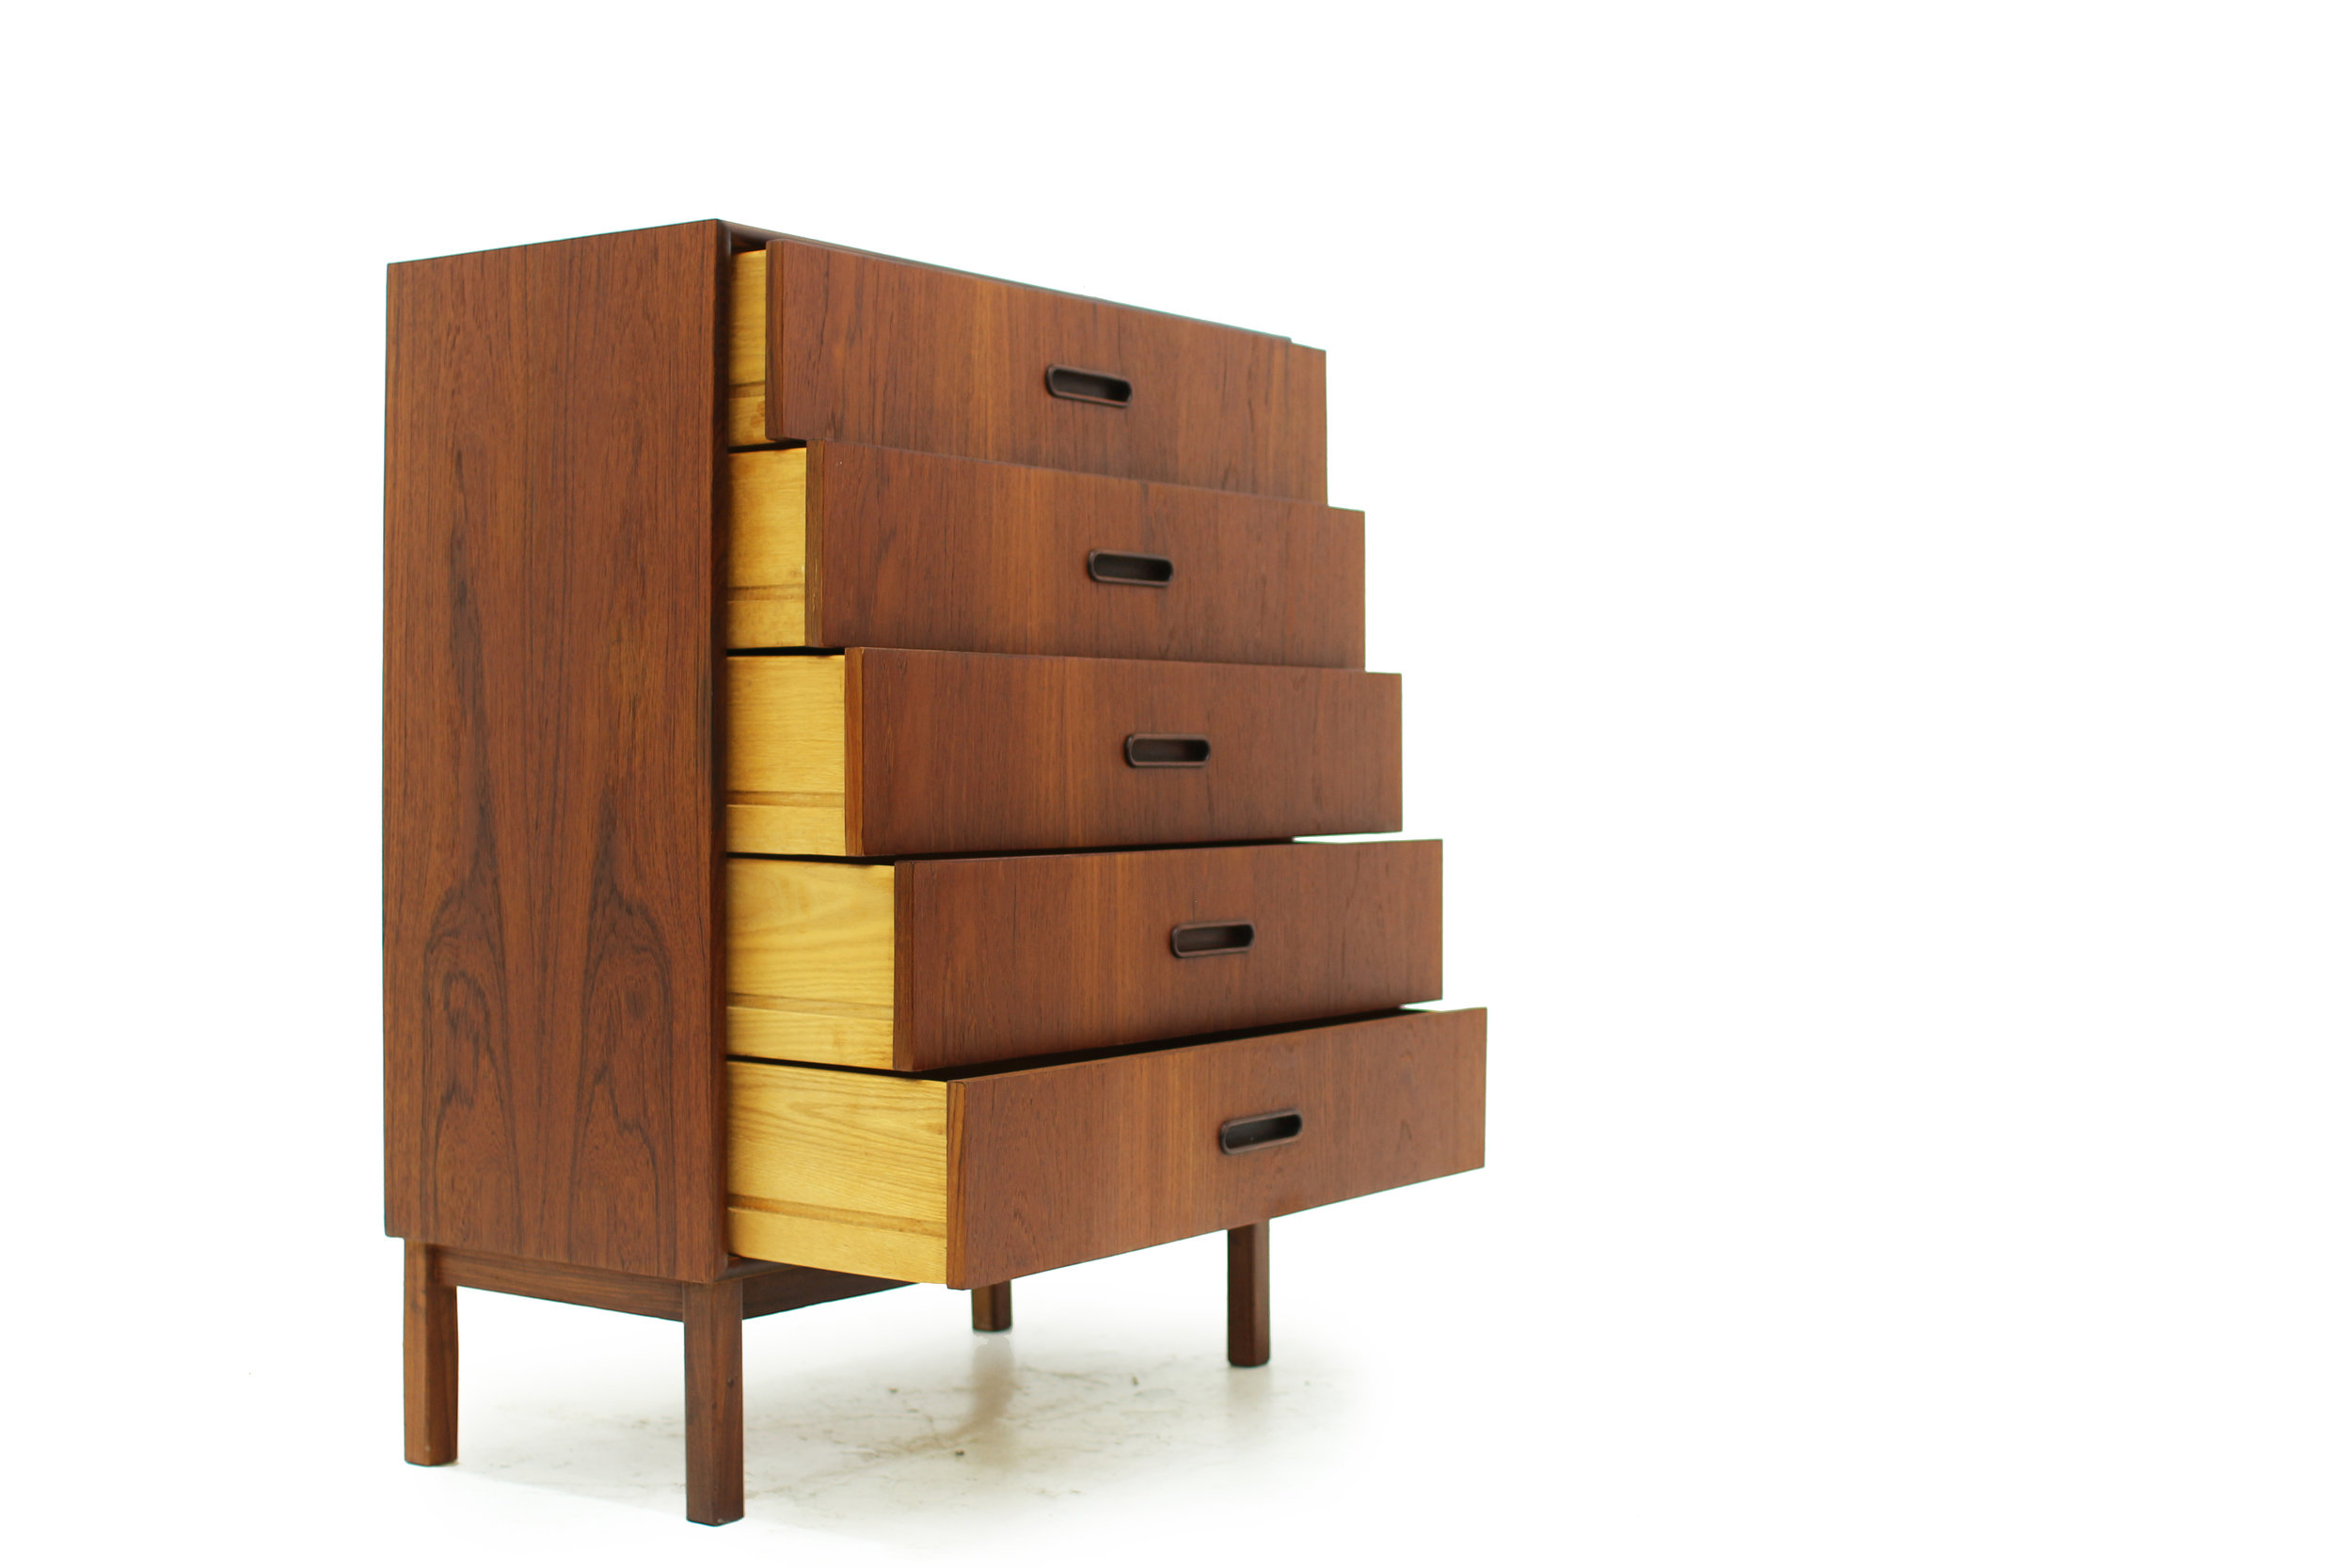 MCM Teak Tallboy Dresser made by Punch Design (4).jpg